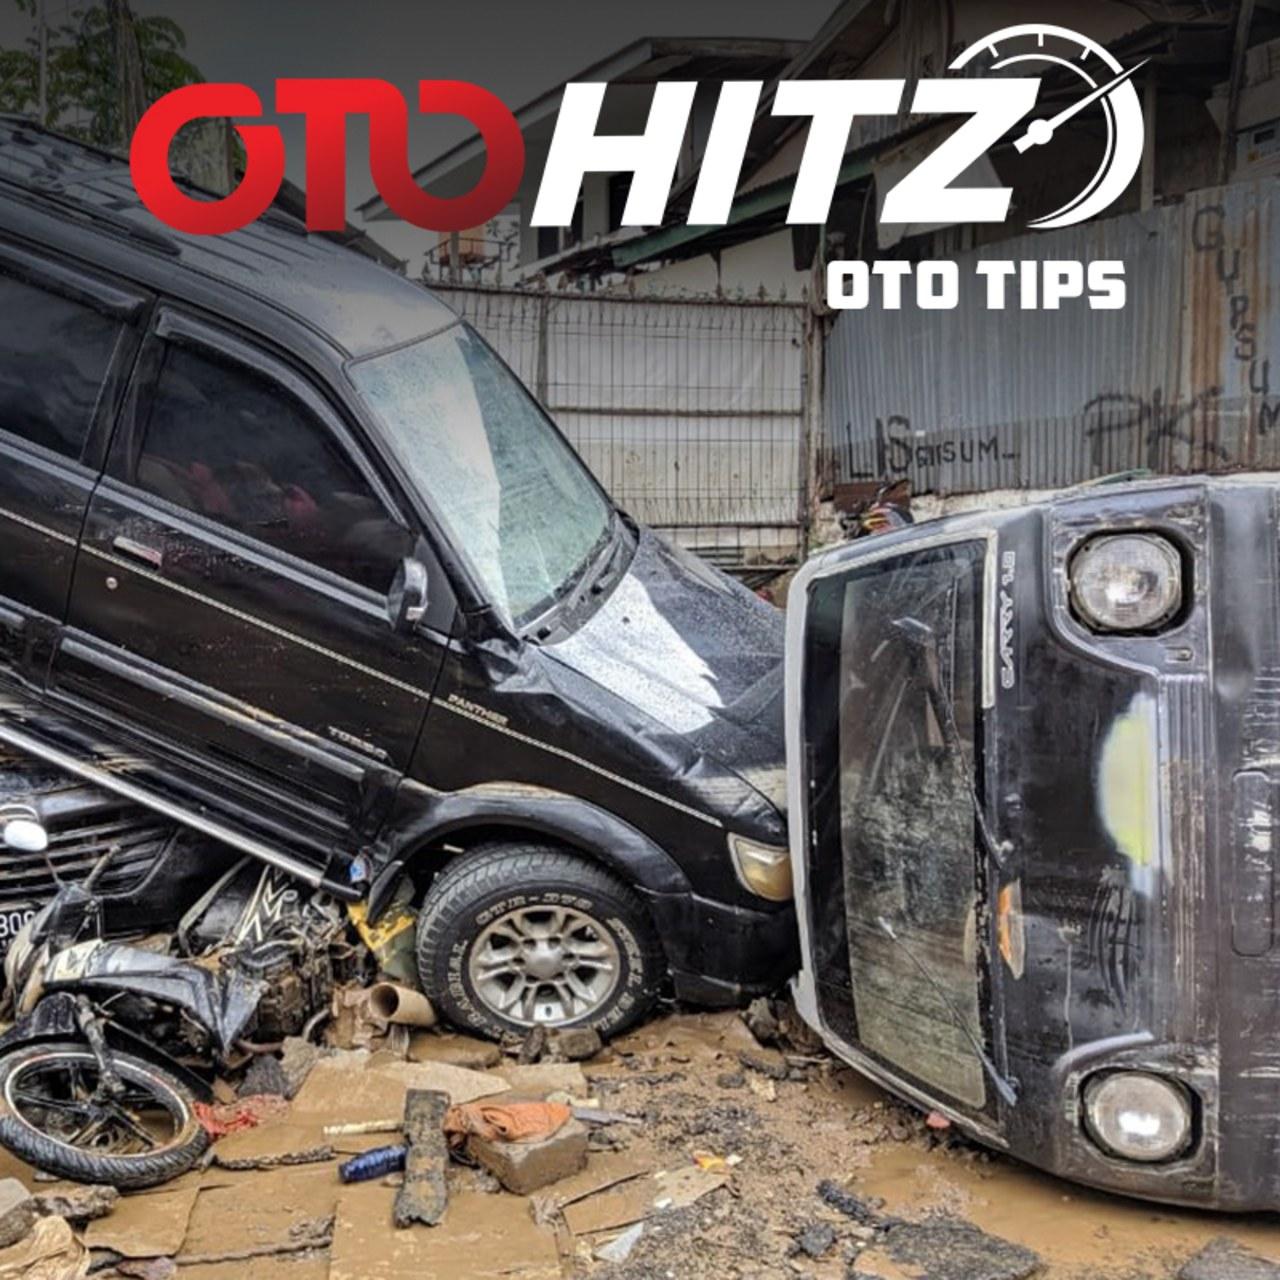 Otomotif, OTOHITZ VIII, OTOTIPS, Banjir